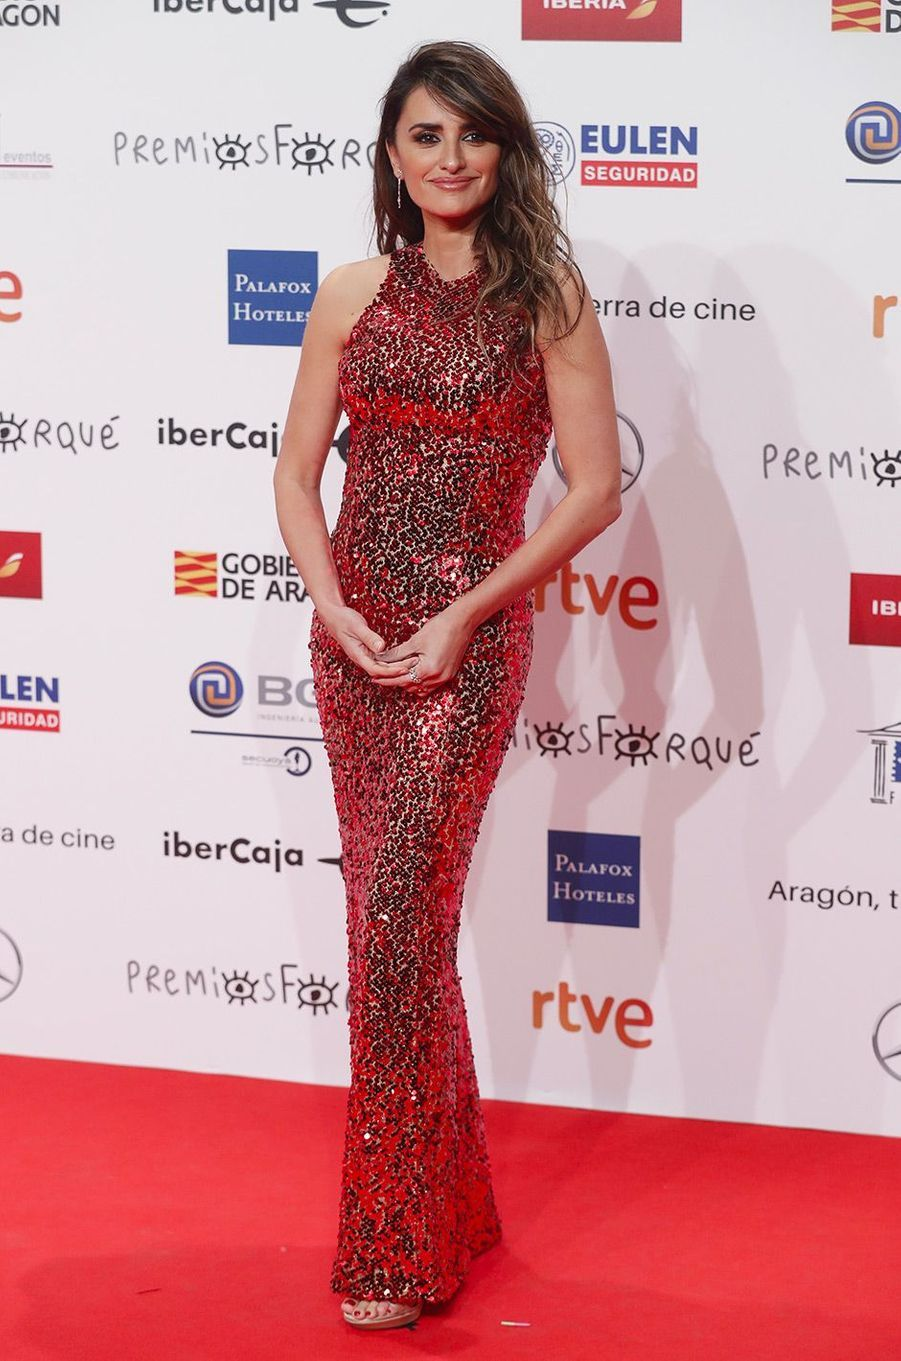 Penélope Cruz à Zaragoza, samedi 12 janvier